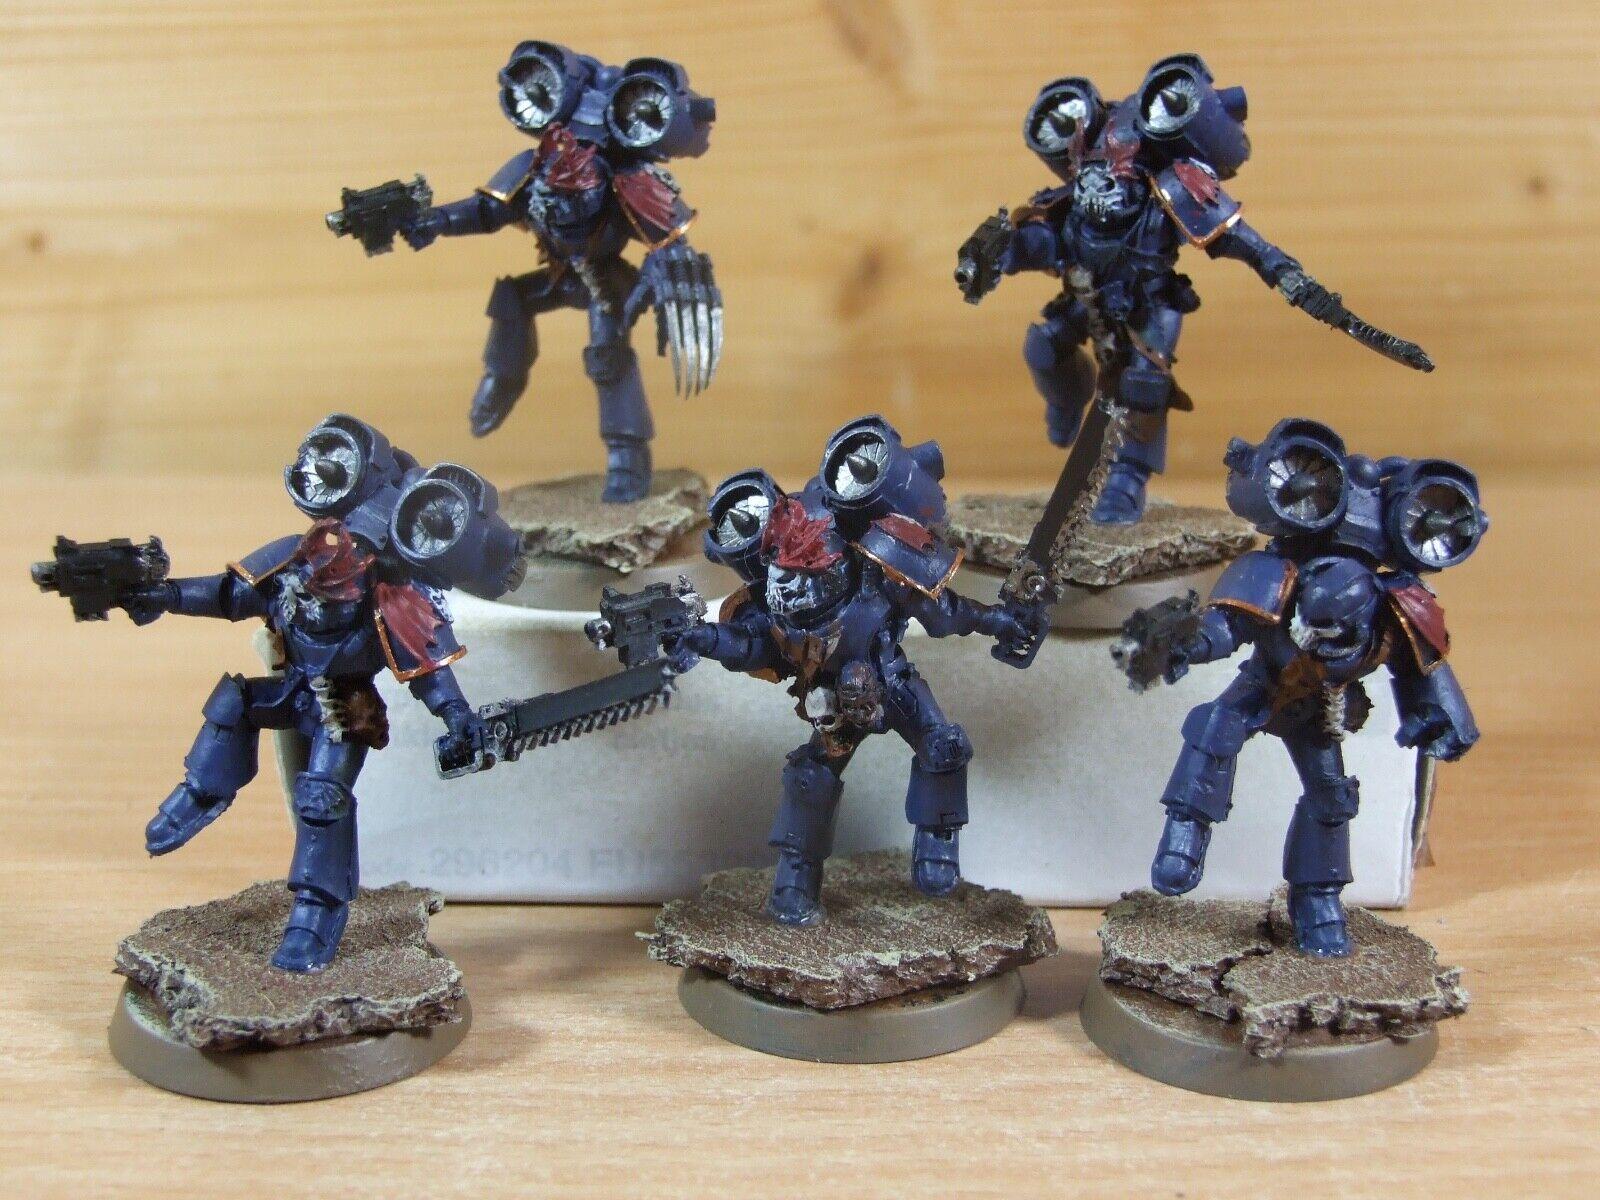 5 Forgeworld Warhammer noche señores Raptors bien pintados (L-1413)